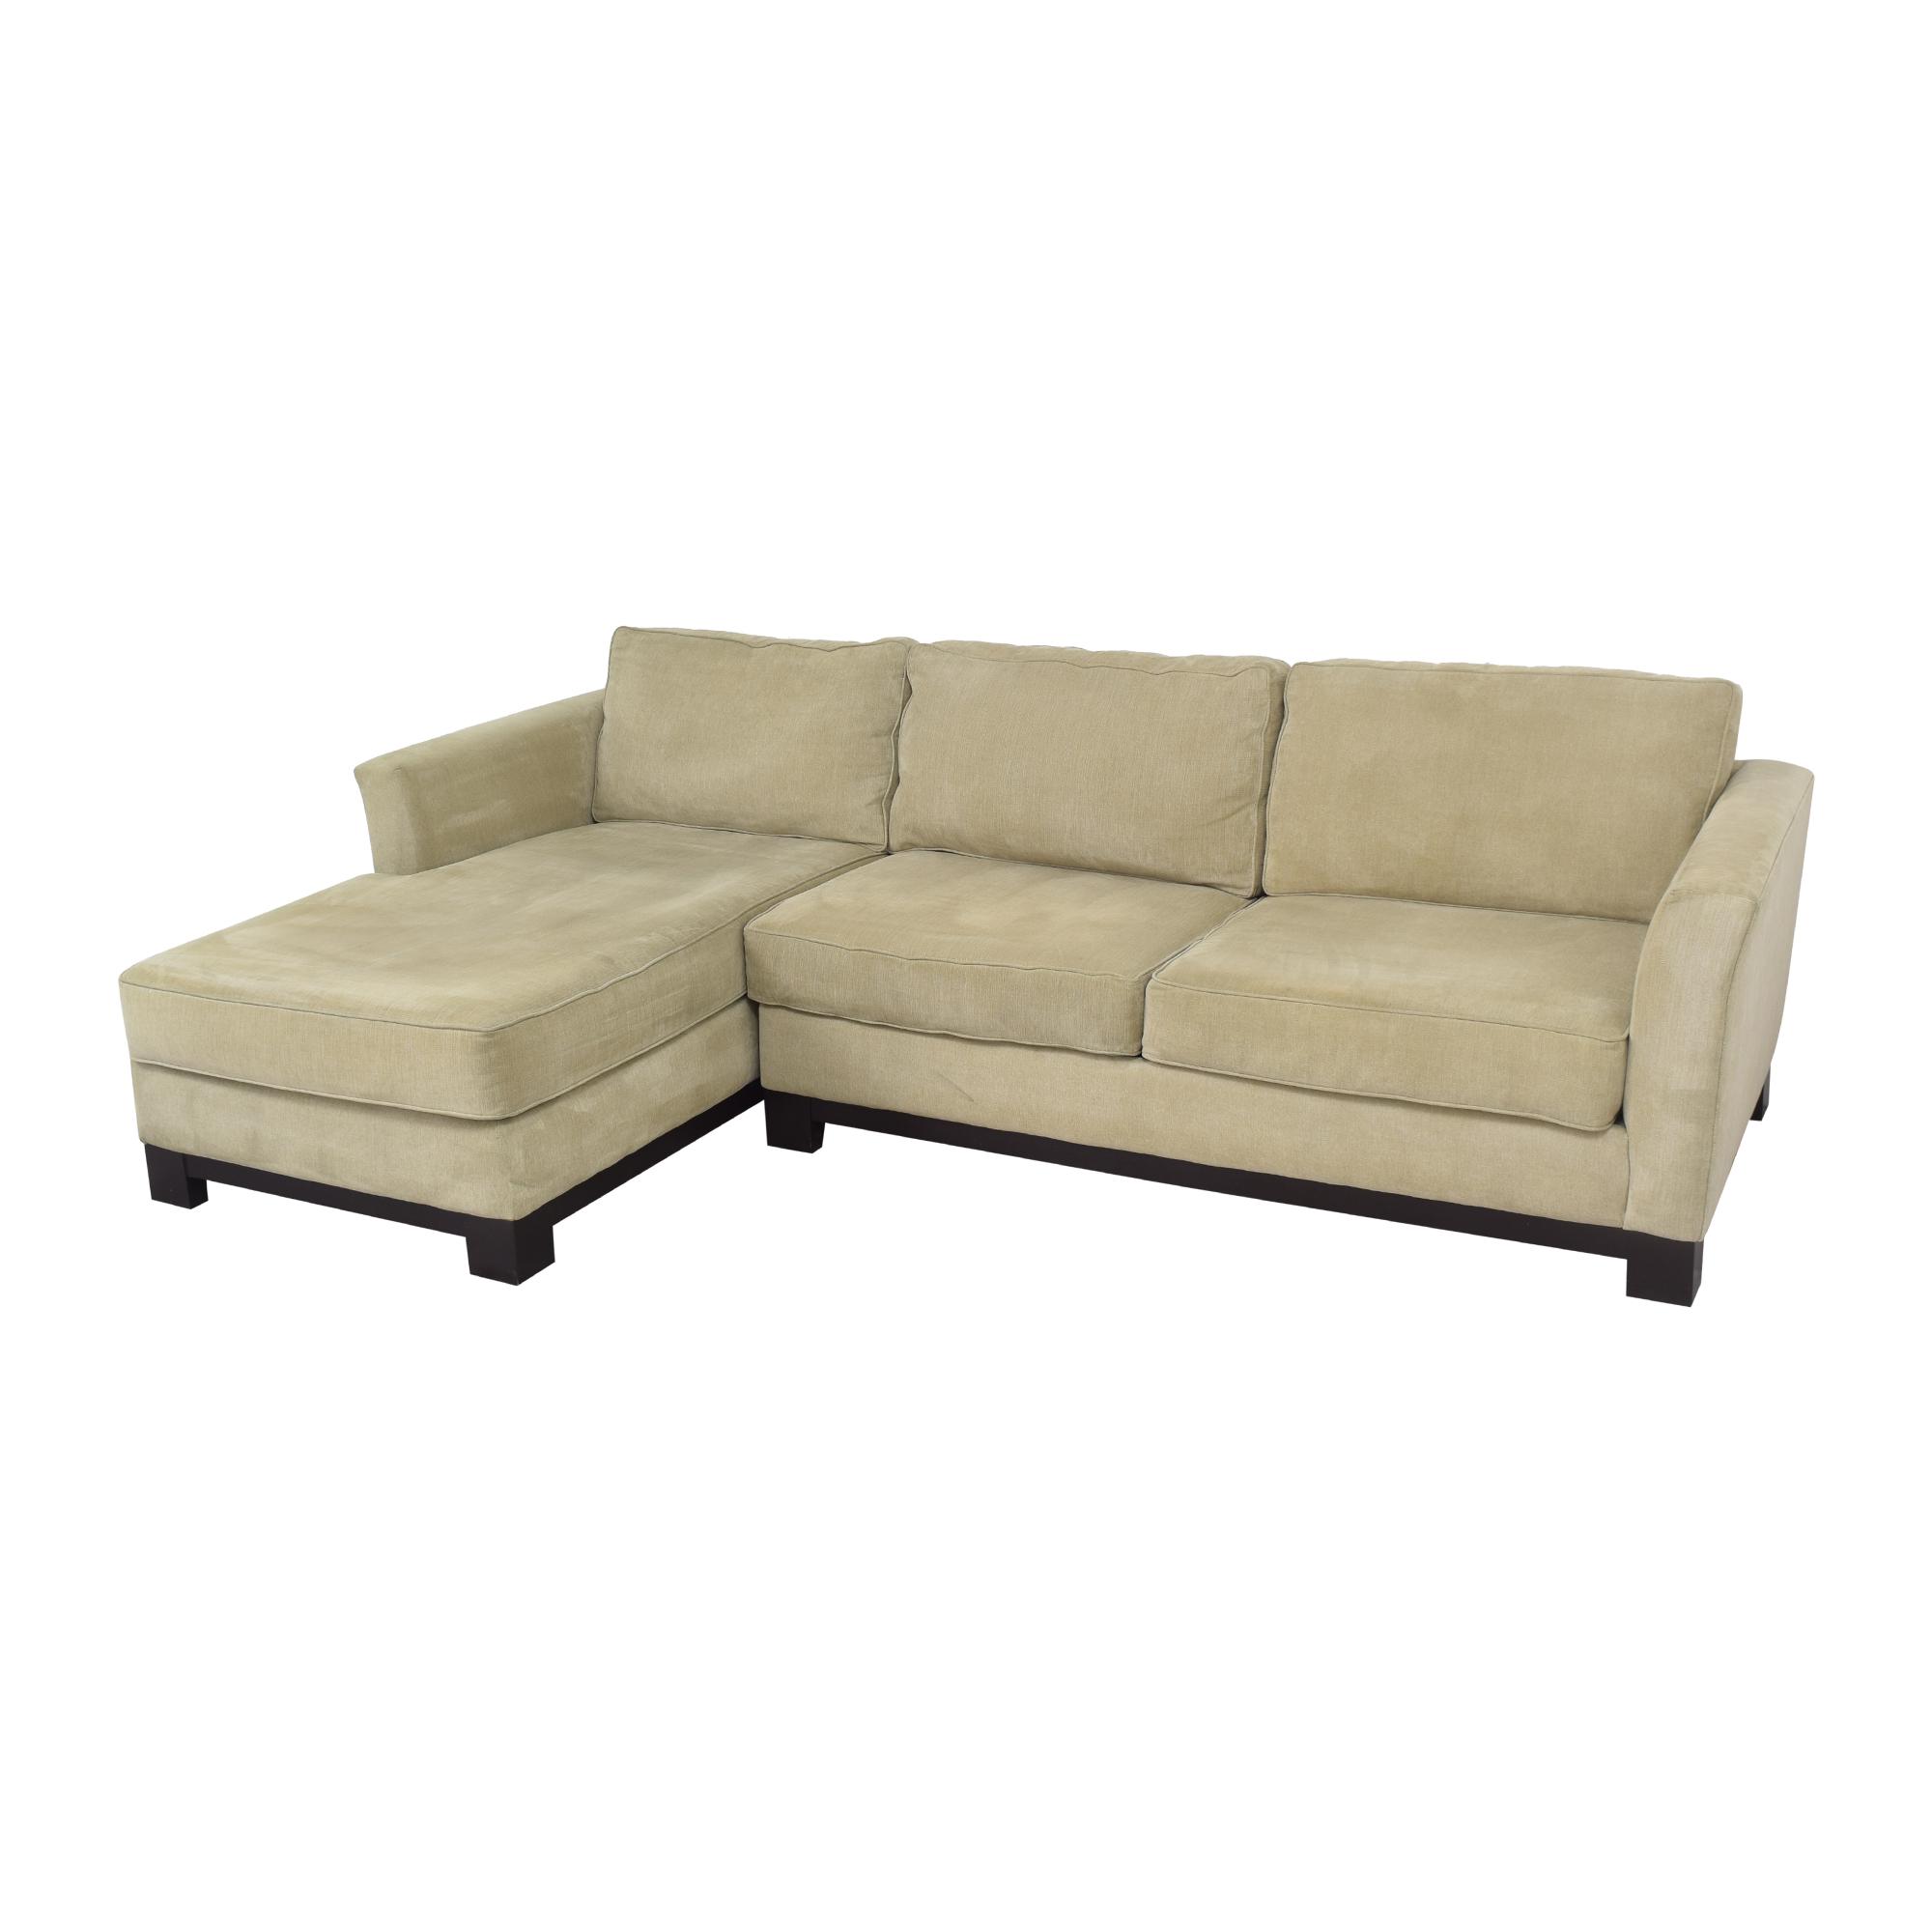 buy Macy's Elliot II Two Piece Chaise Sectional Sofa Macy's